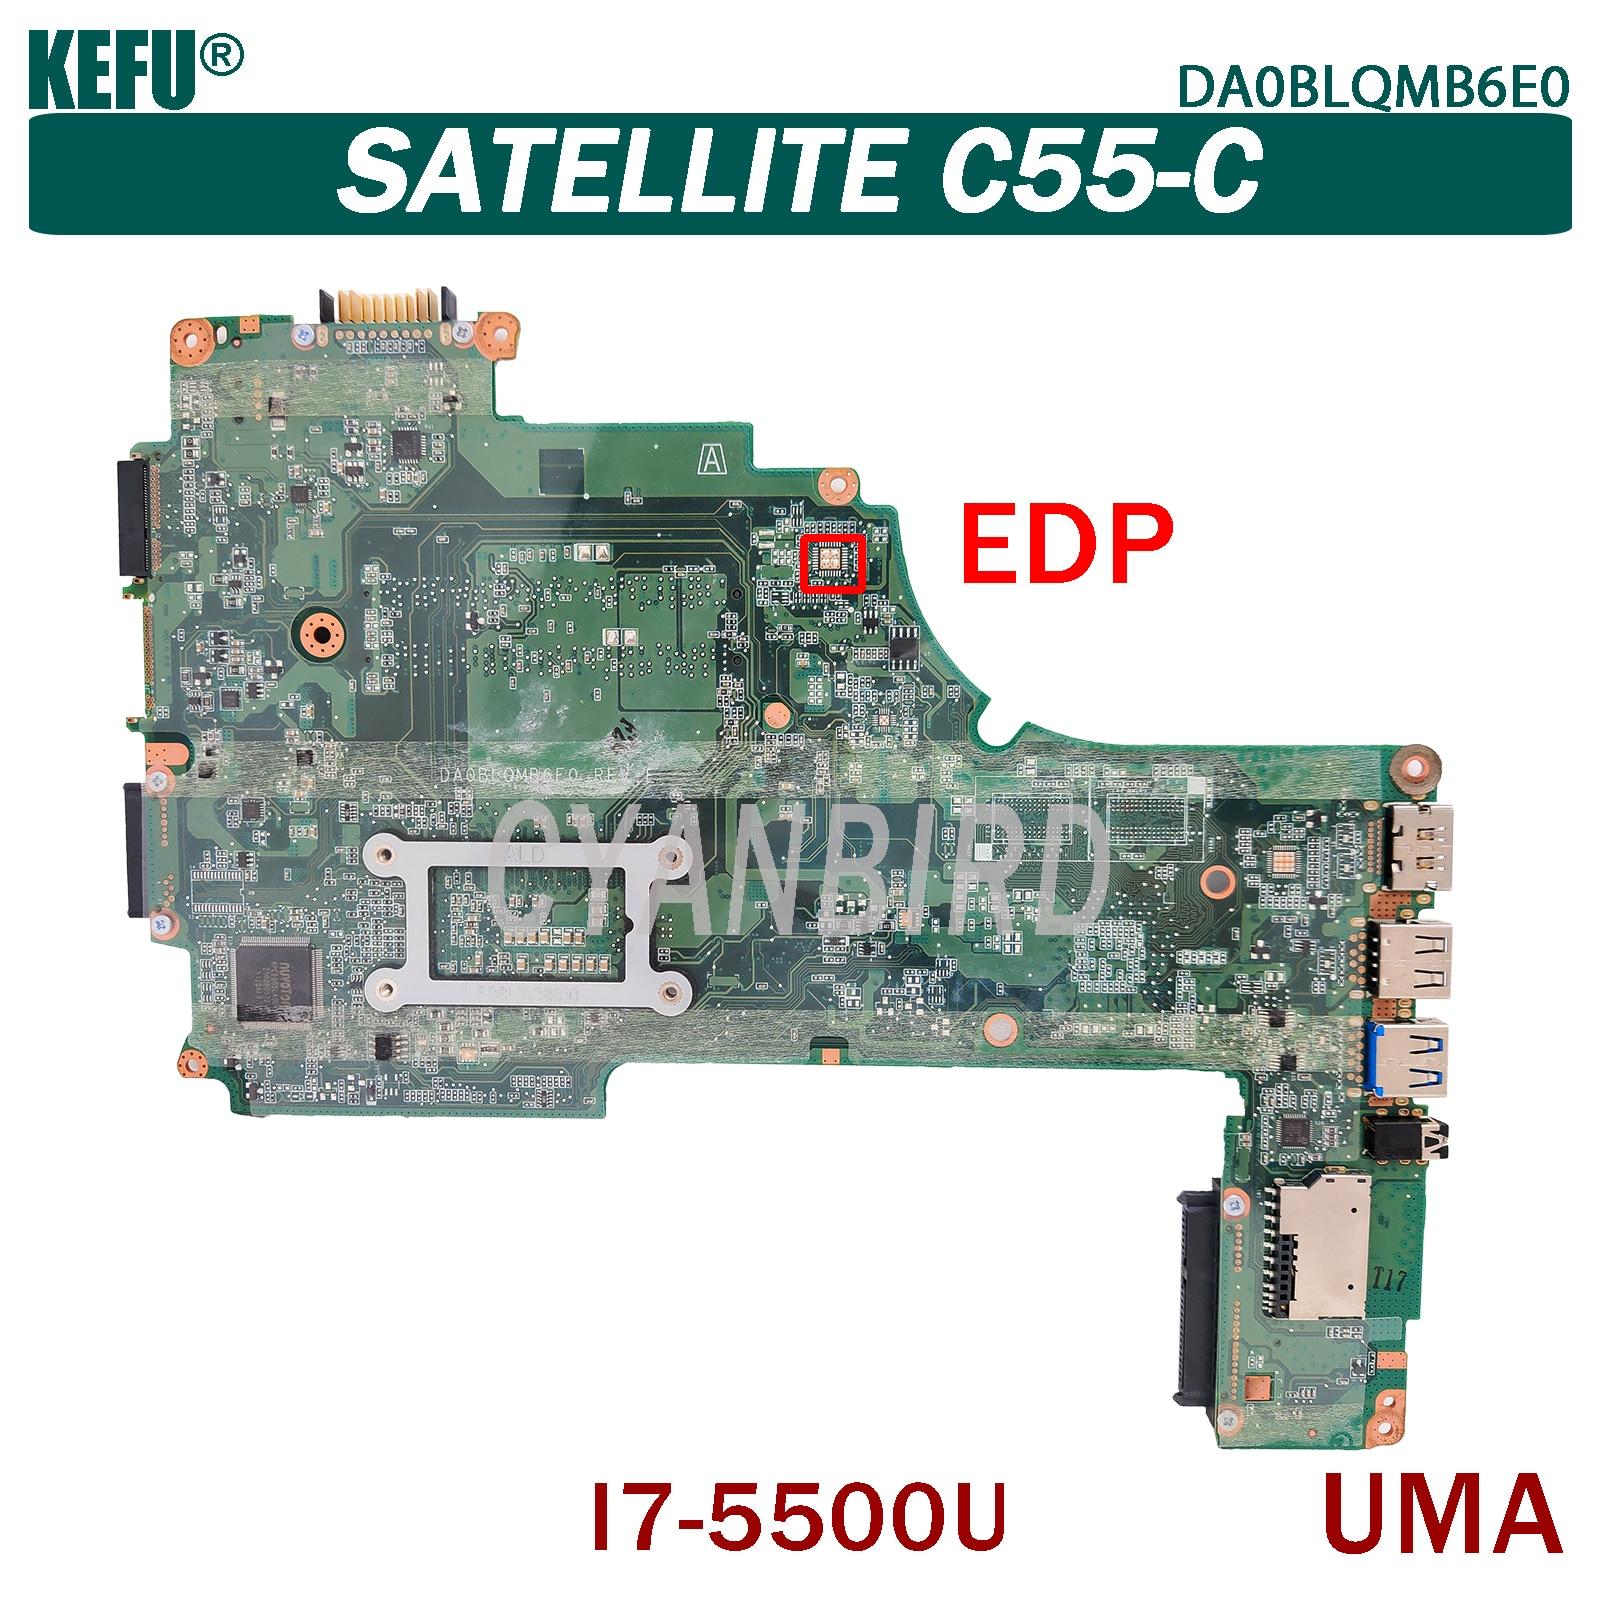 KEFU DA0BLQMB6E0 اللوحة الرئيسية الأصلية لتوتوشيبا الأقمار الصناعية C55-C UMA EDP مع I7-5500U اللوحة الأم للكمبيوتر المحمول